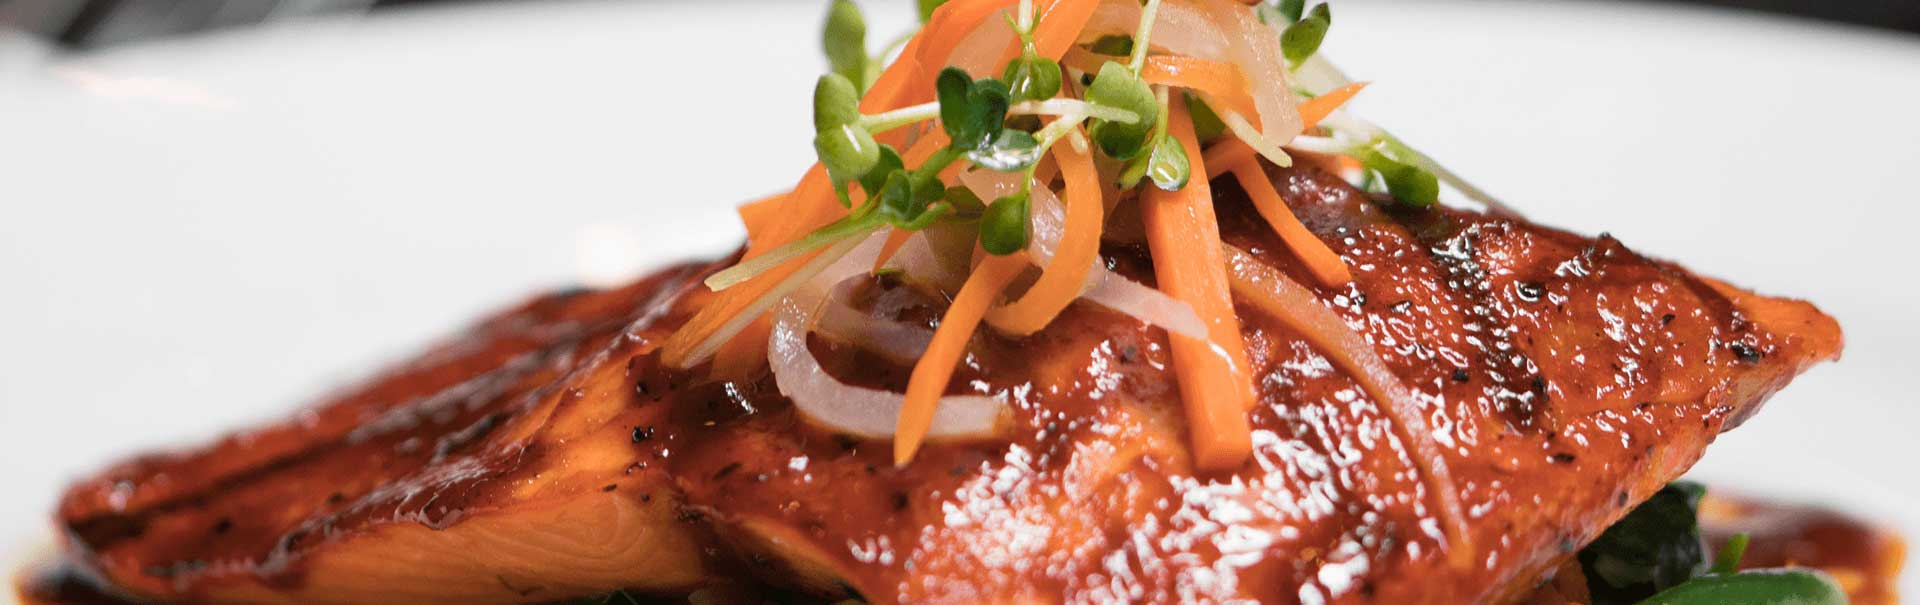 seafood restaurant website design